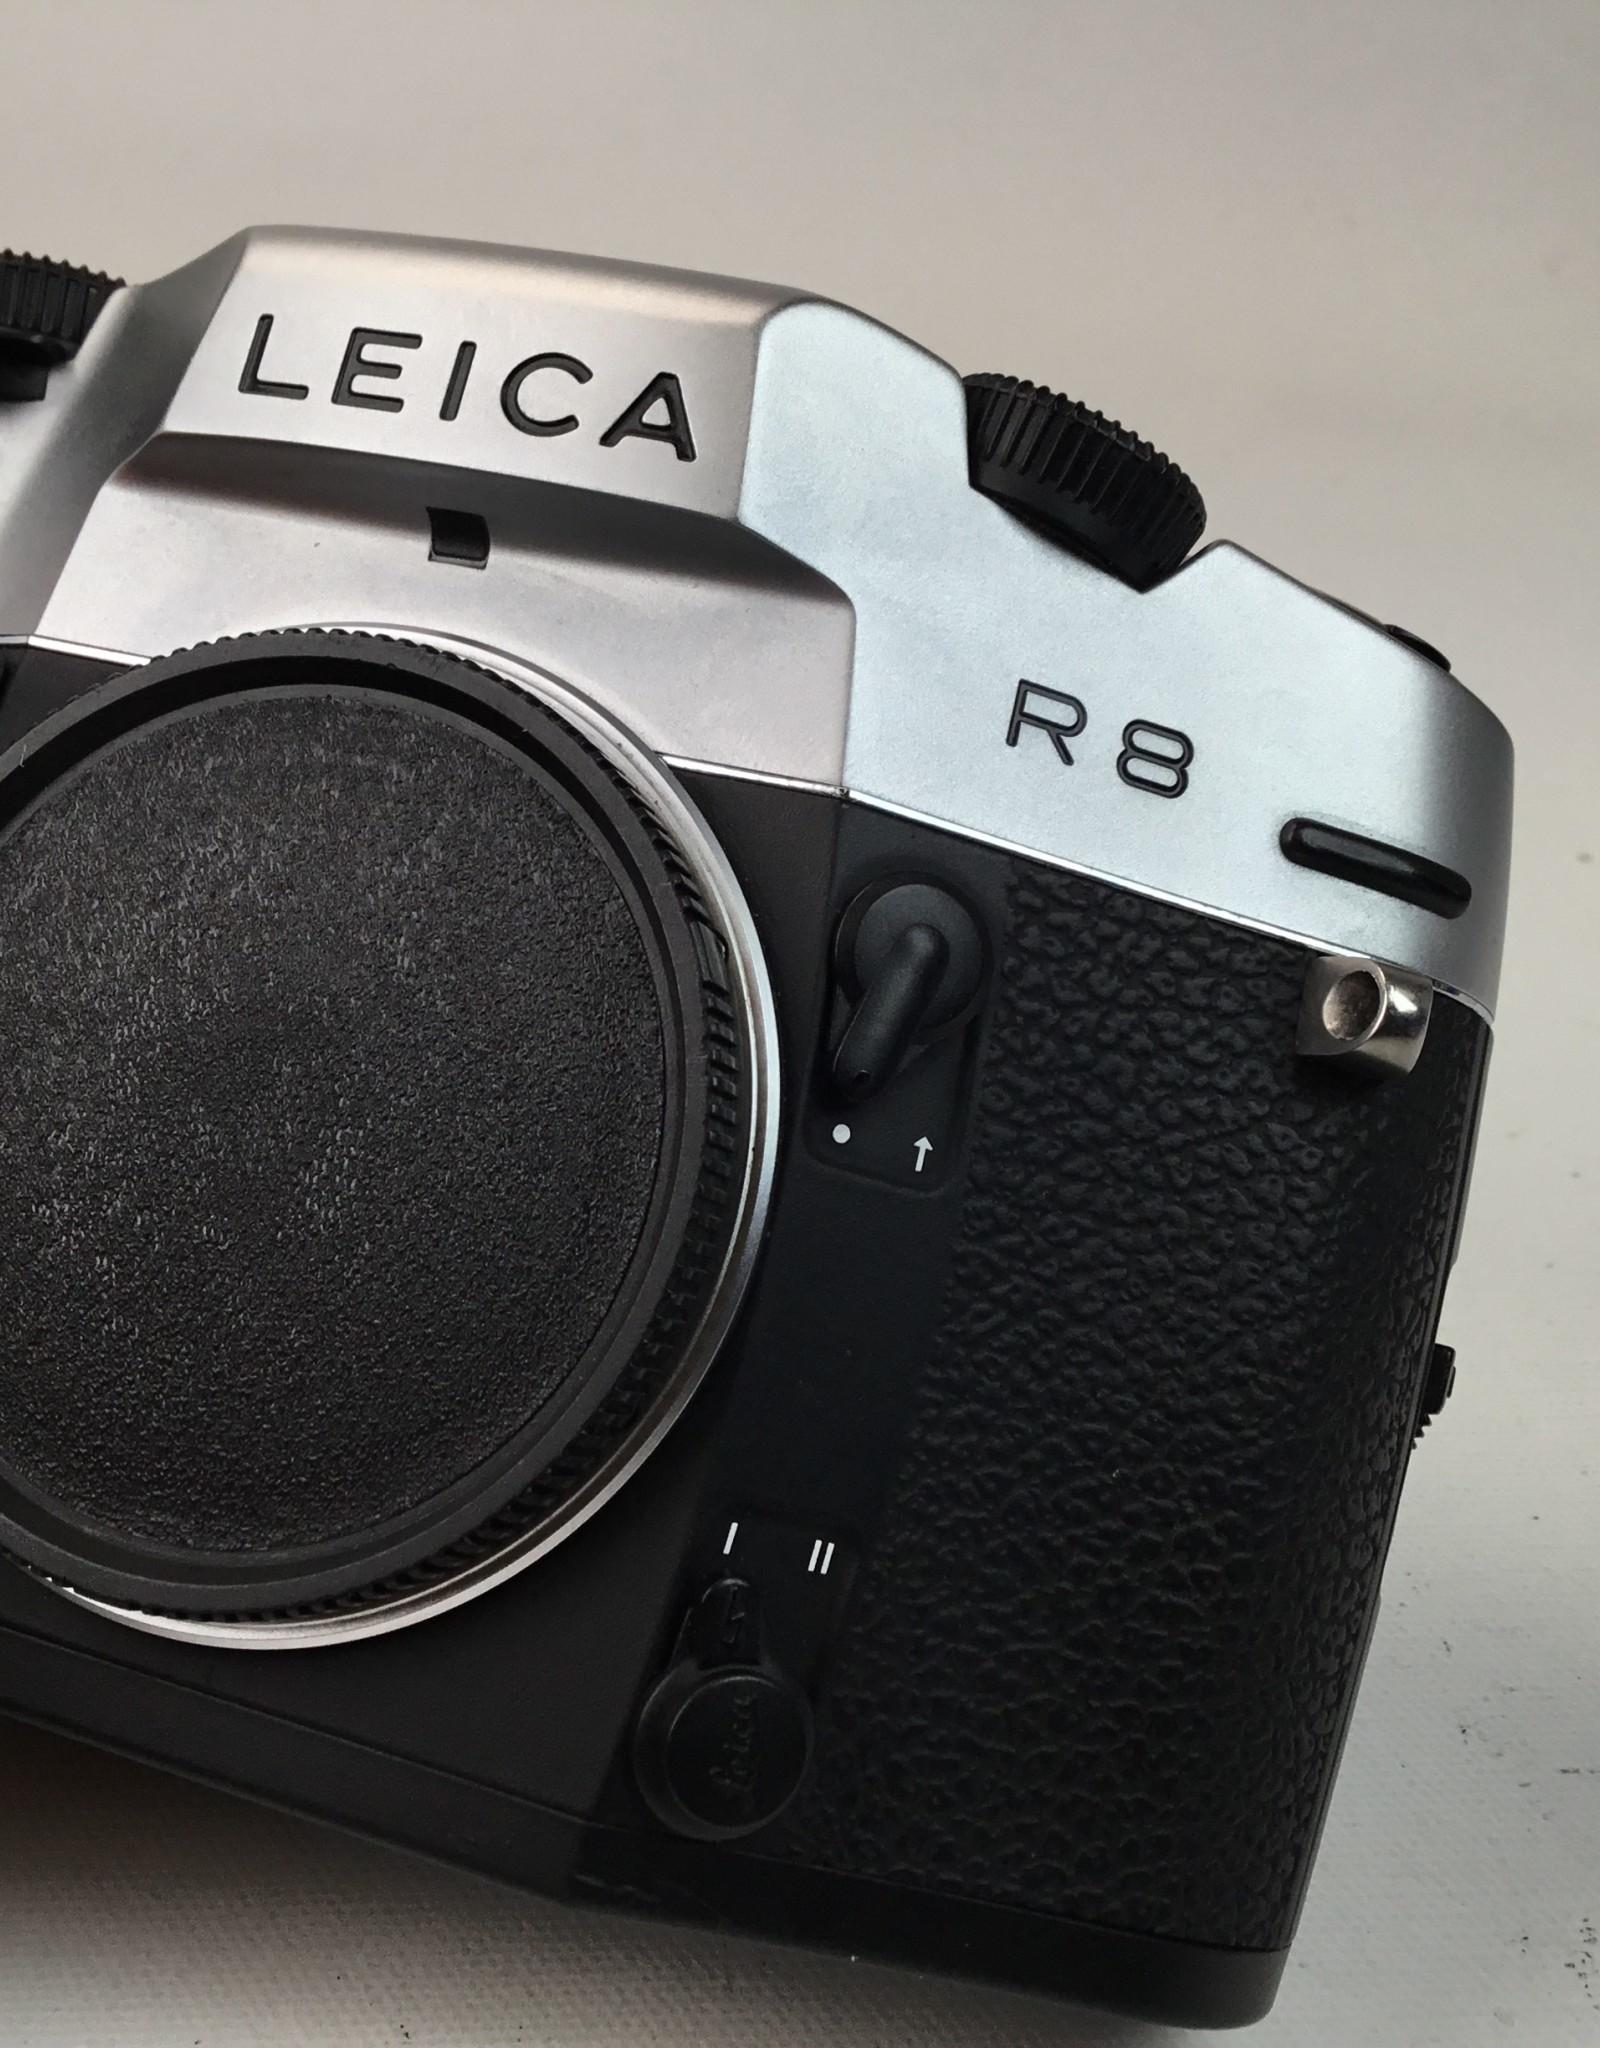 Leica Leica R8 Camera Body Silver Chromium Finish in Box Used EX+